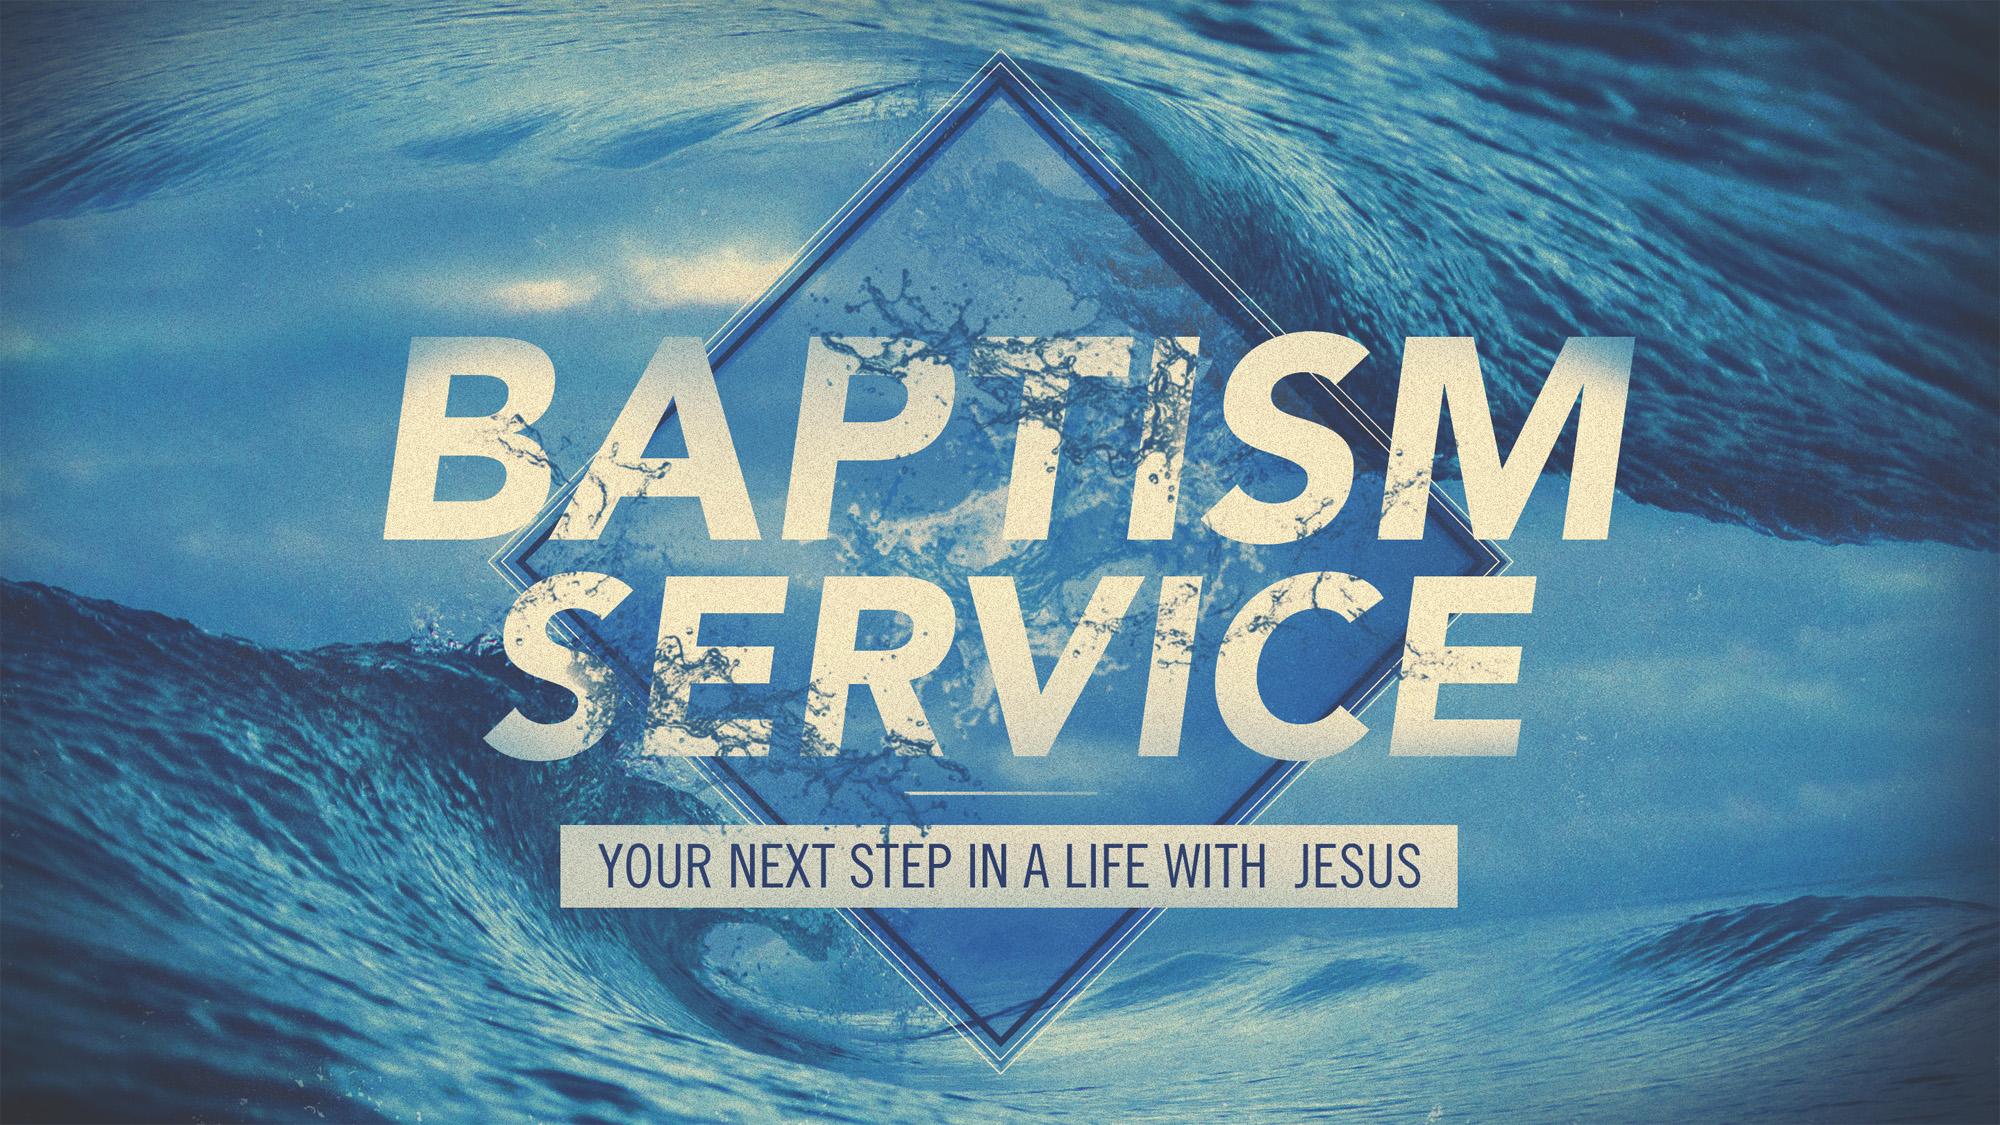 baptism_service-title-1-Wide 16x9.jpg